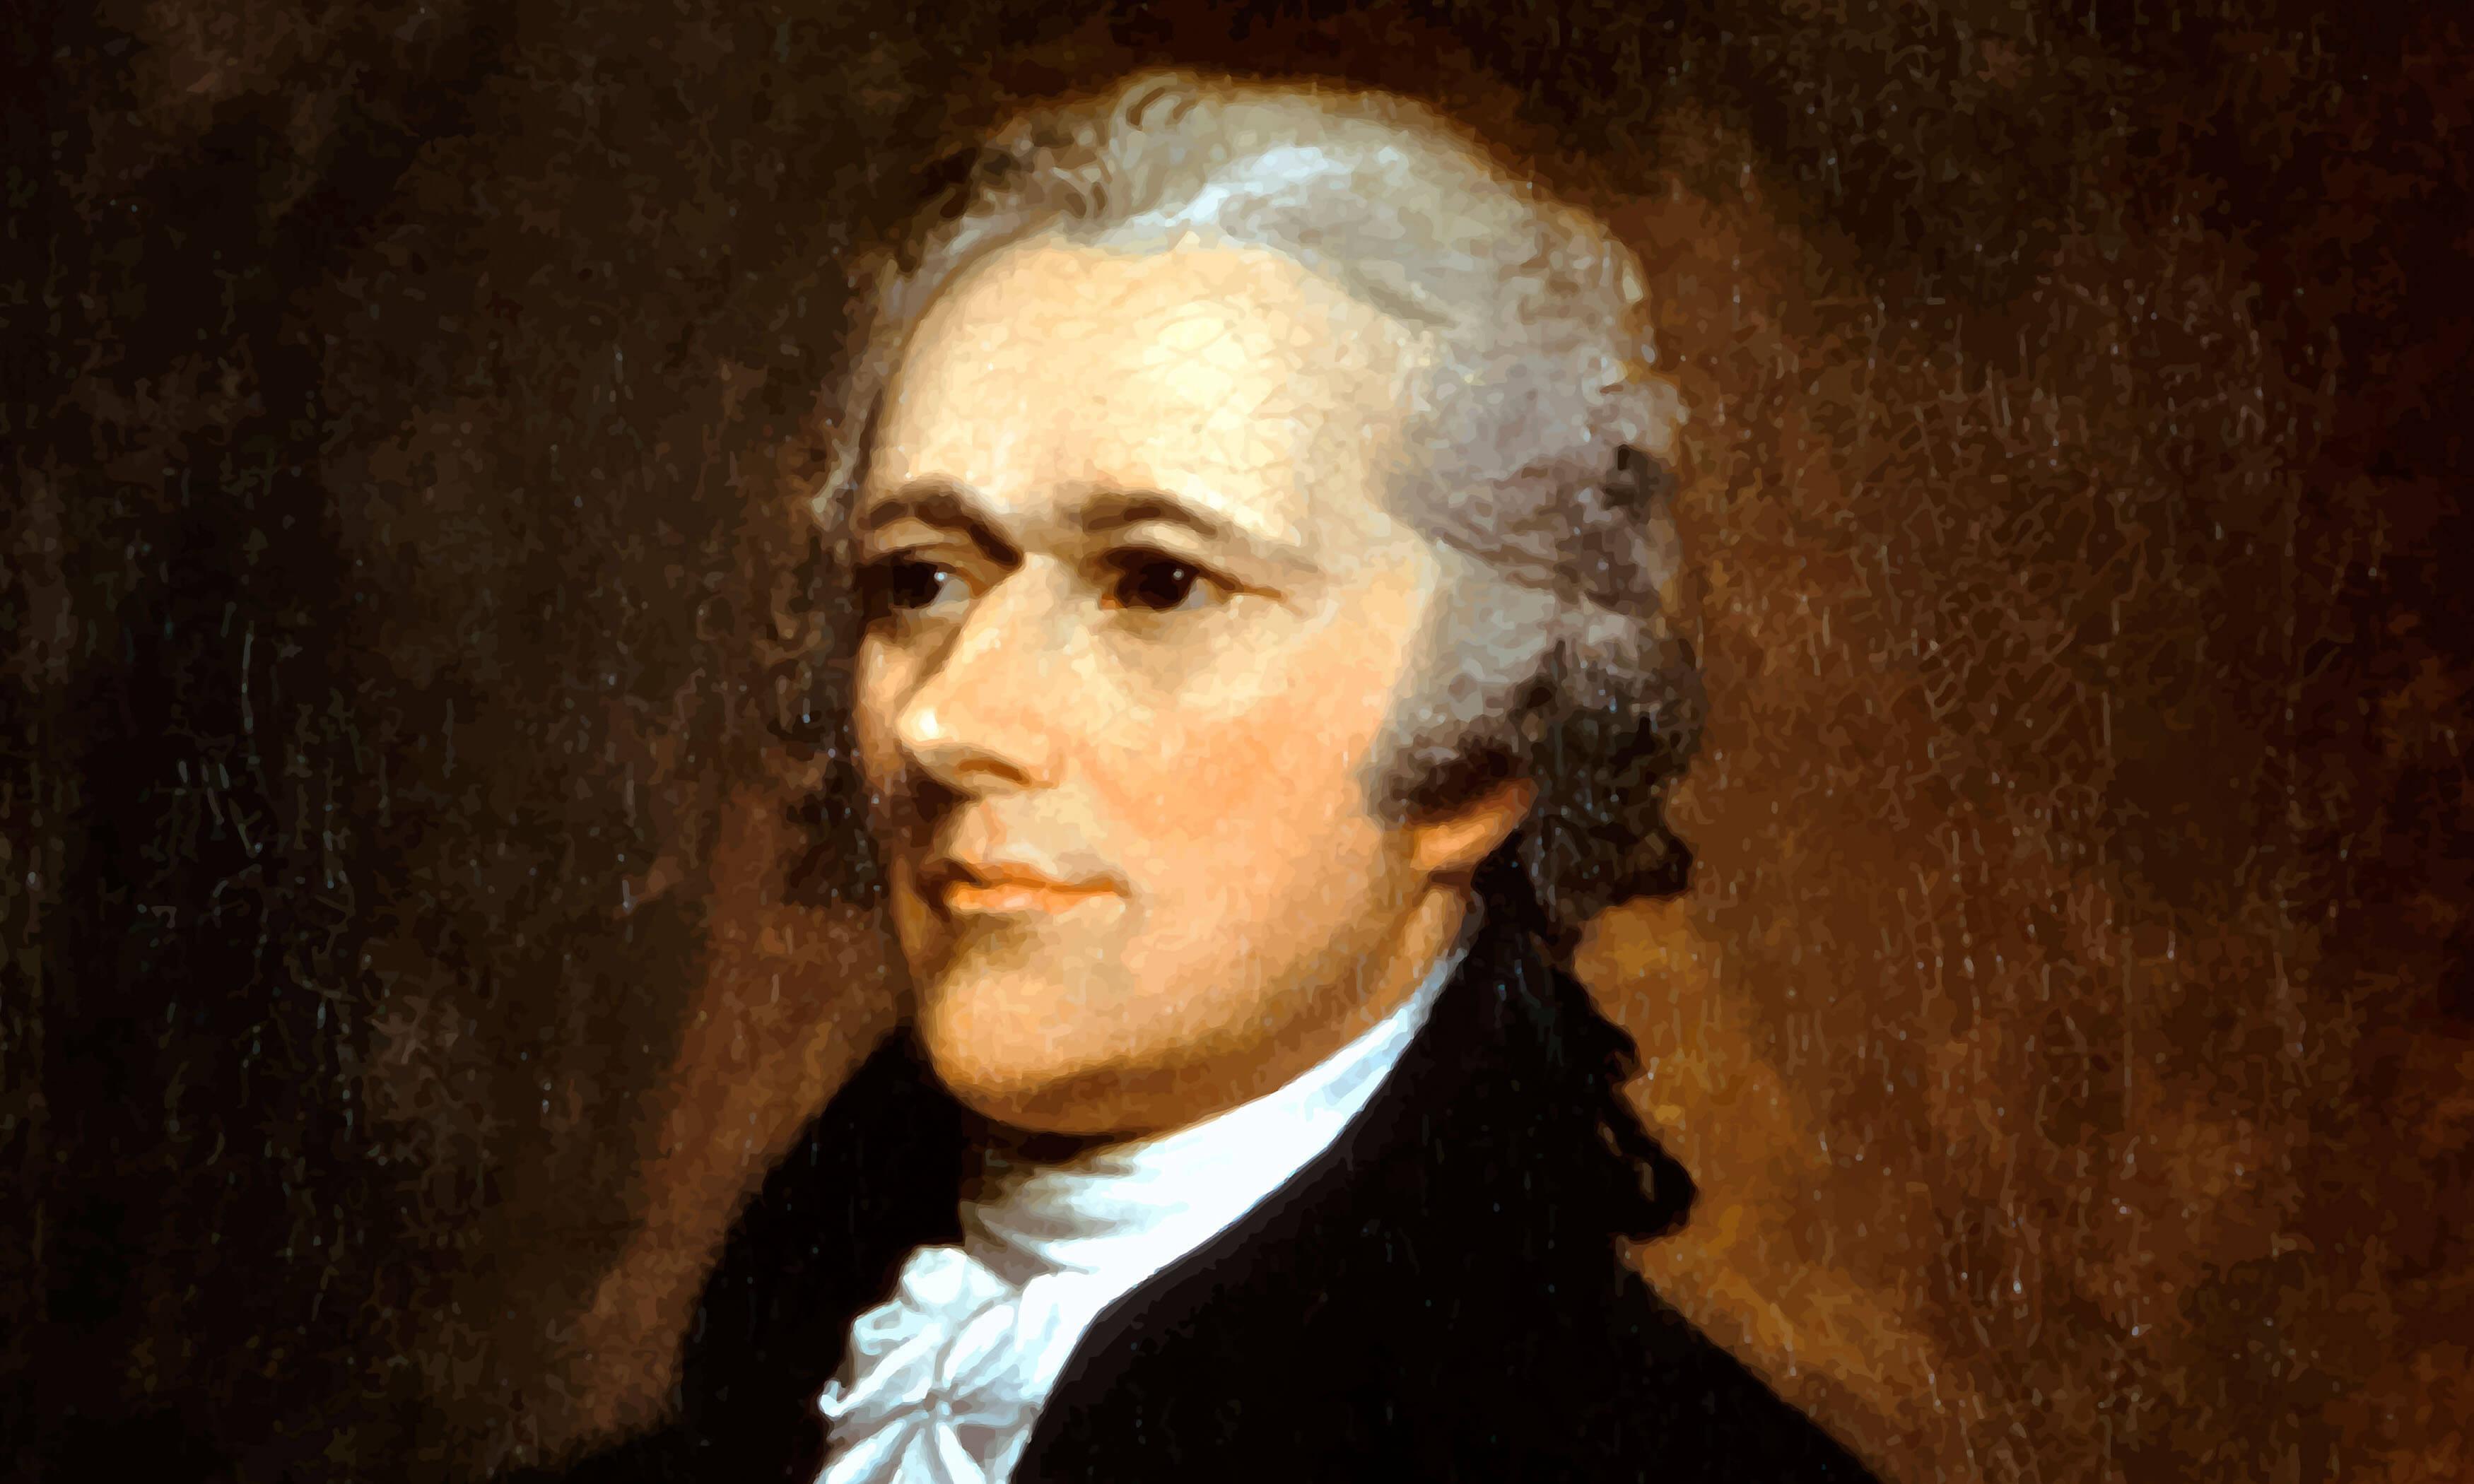 Painting of Alexander Hamilton